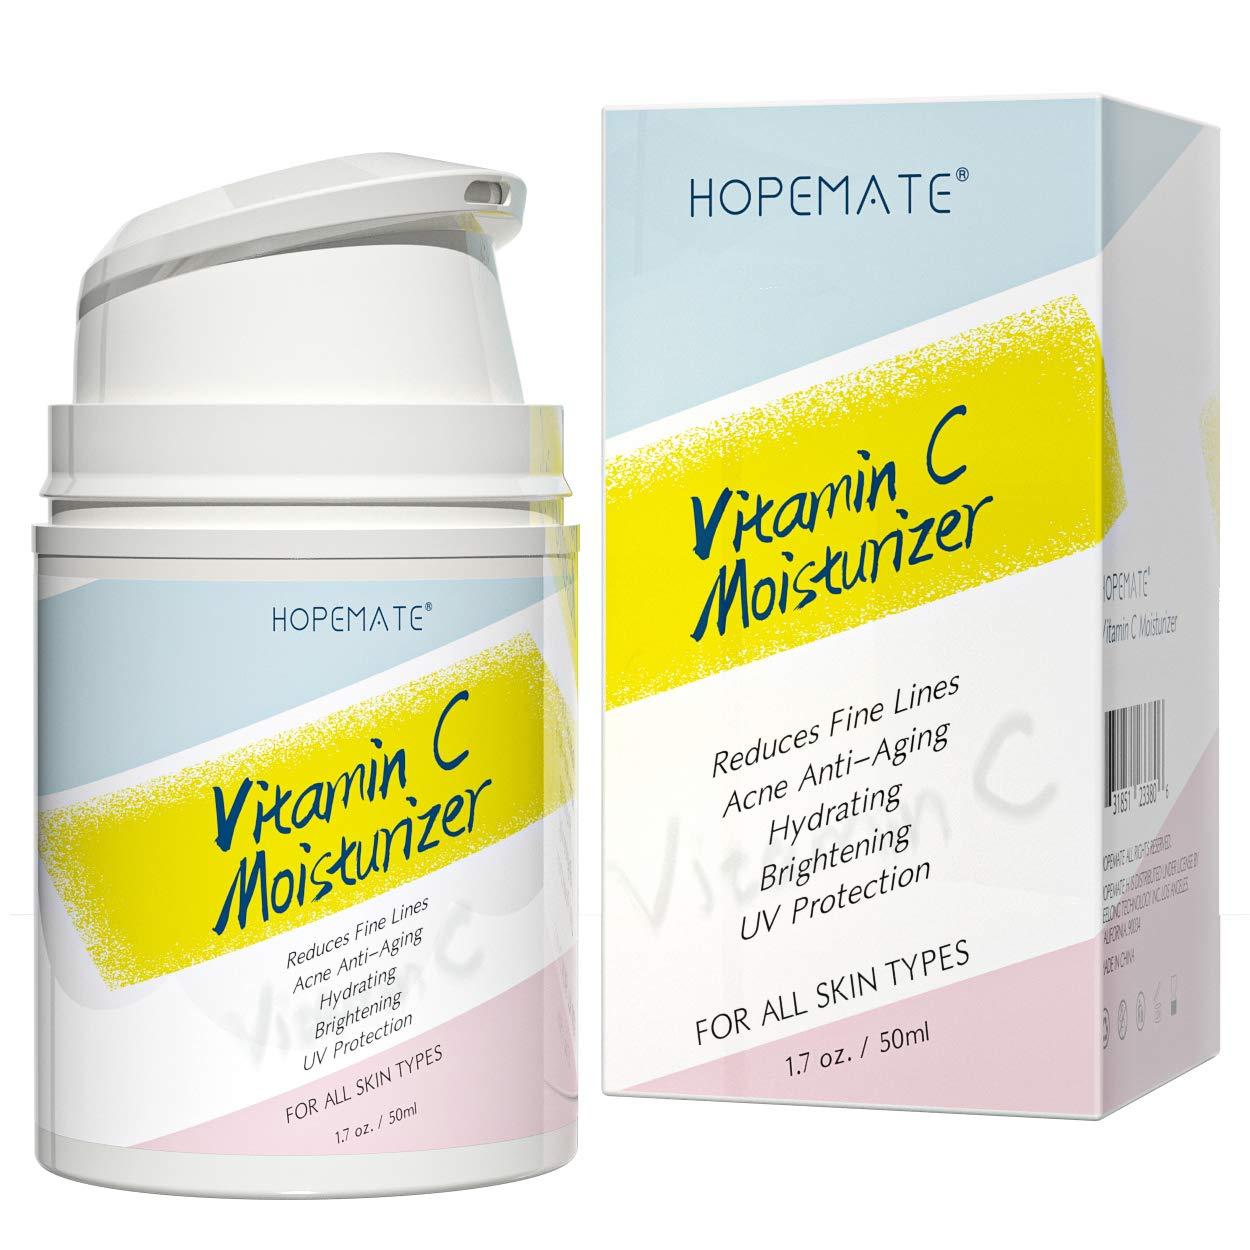 HOPEMATE H Vitamin C Moisturizer-Anti aging, Reduce Wrinkles & Dark Spot, Daily for Dry, Sensitive, Oily Skin Restore - Boost Collagen Cream, 1.7OZ